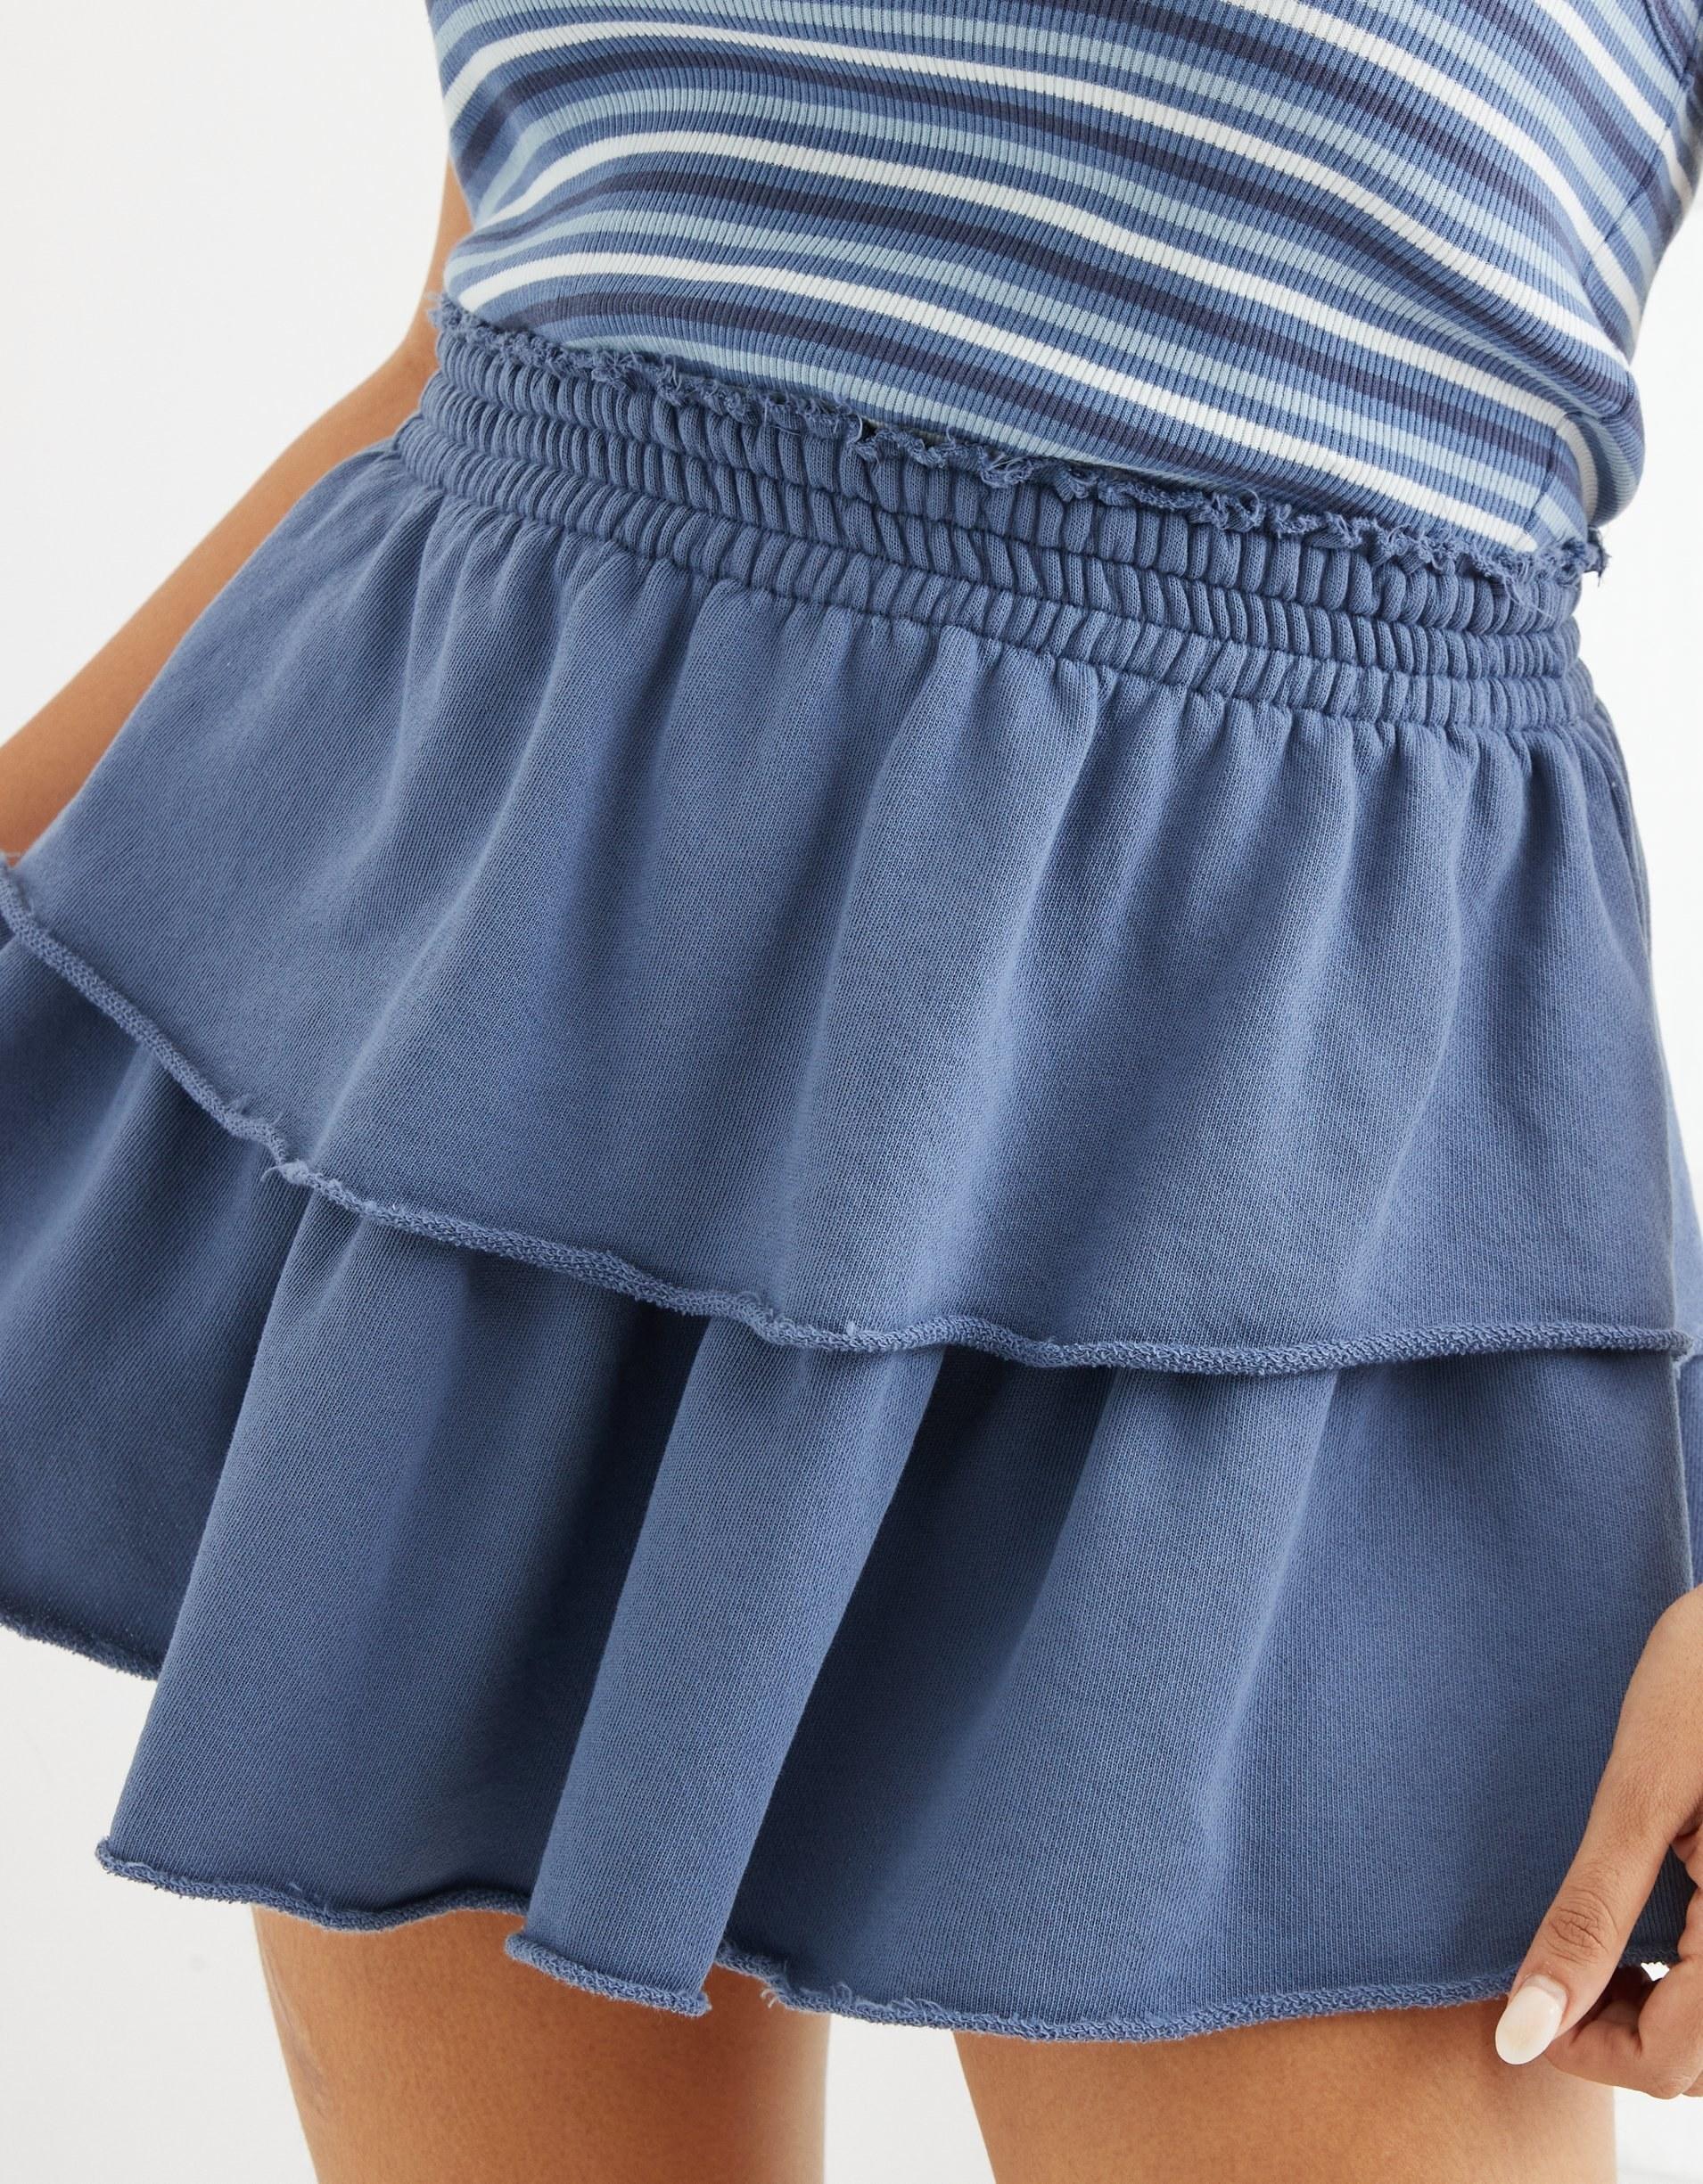 Woman wearing blue skirt